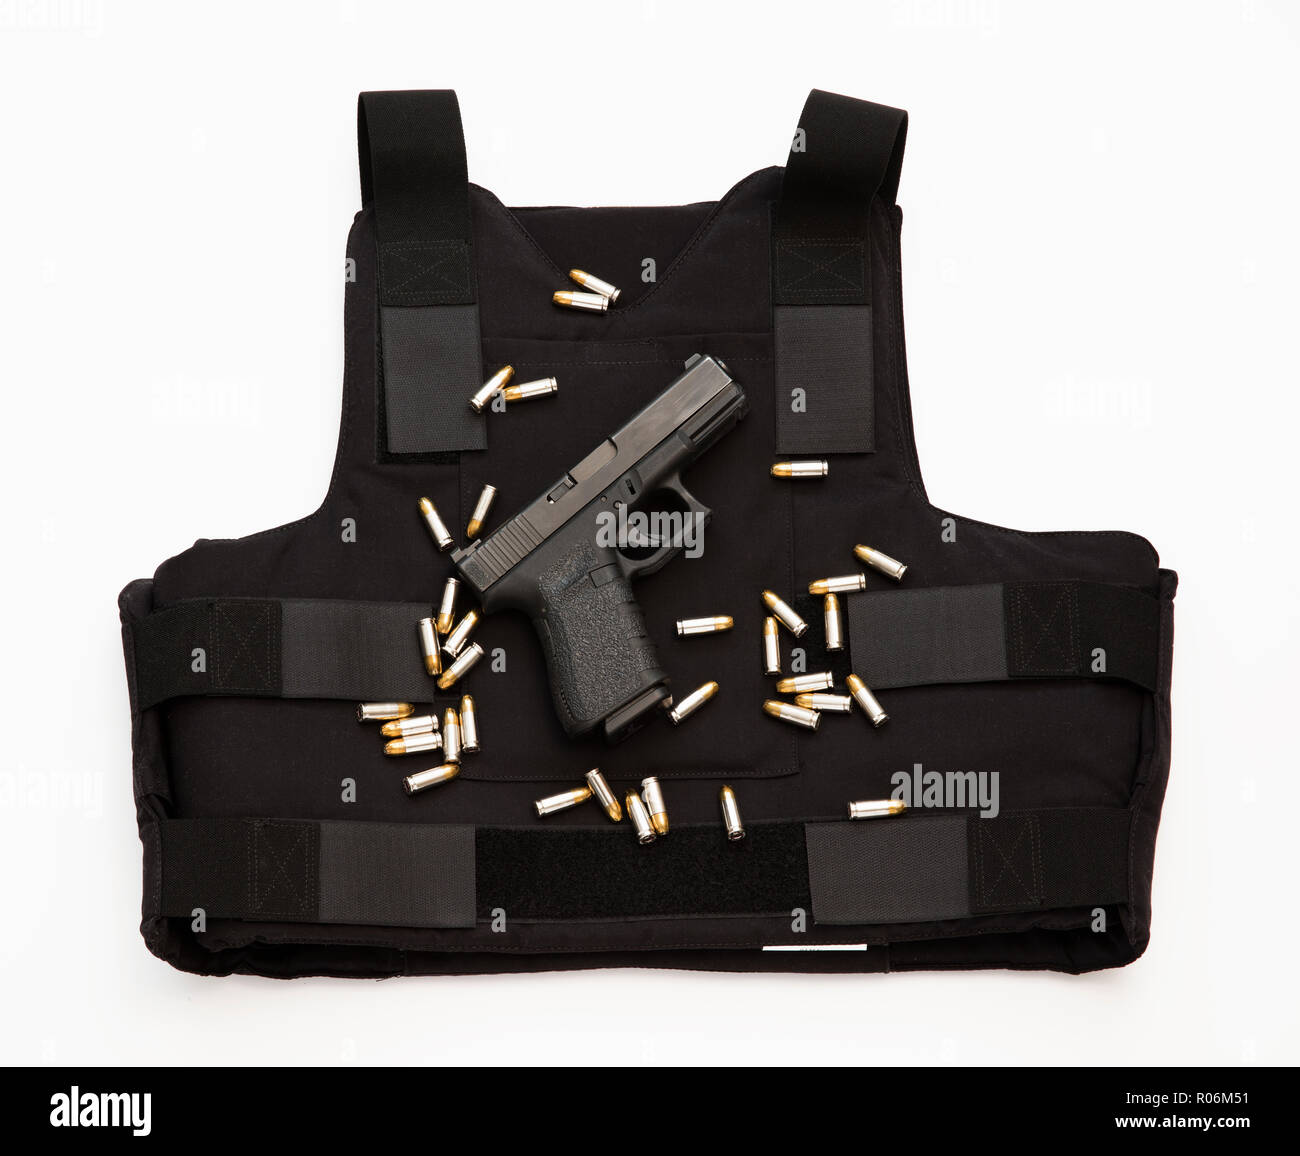 Glock semiautomatic pistol and bulletproof vest. - Stock Image